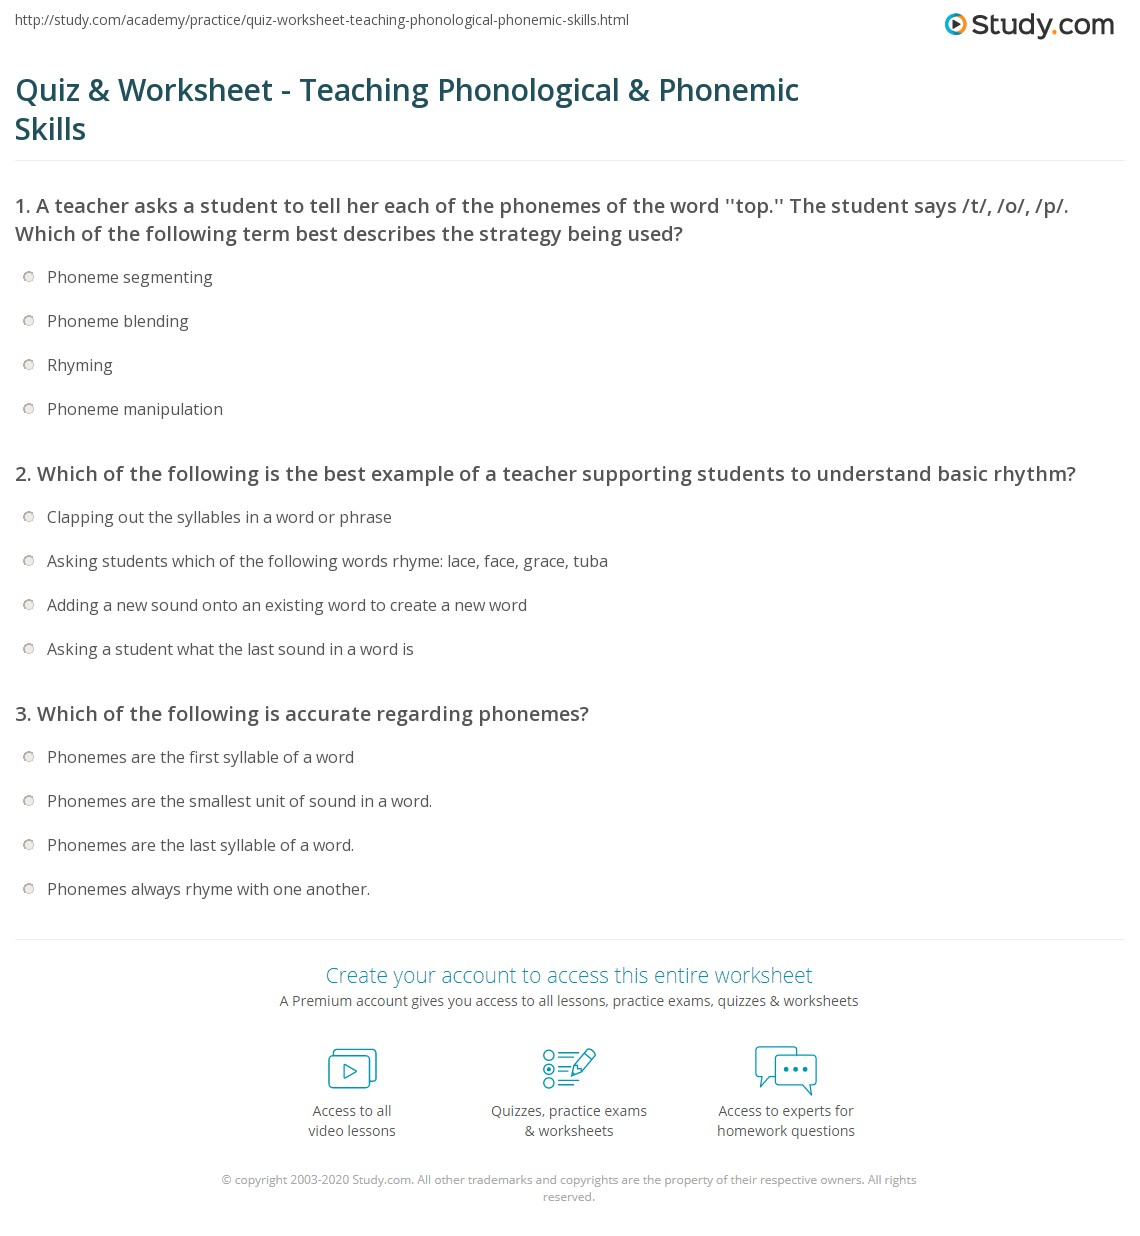 Quiz Worksheet Teaching Phonological Phonemic Skills – Phoneme Segmentation Worksheets